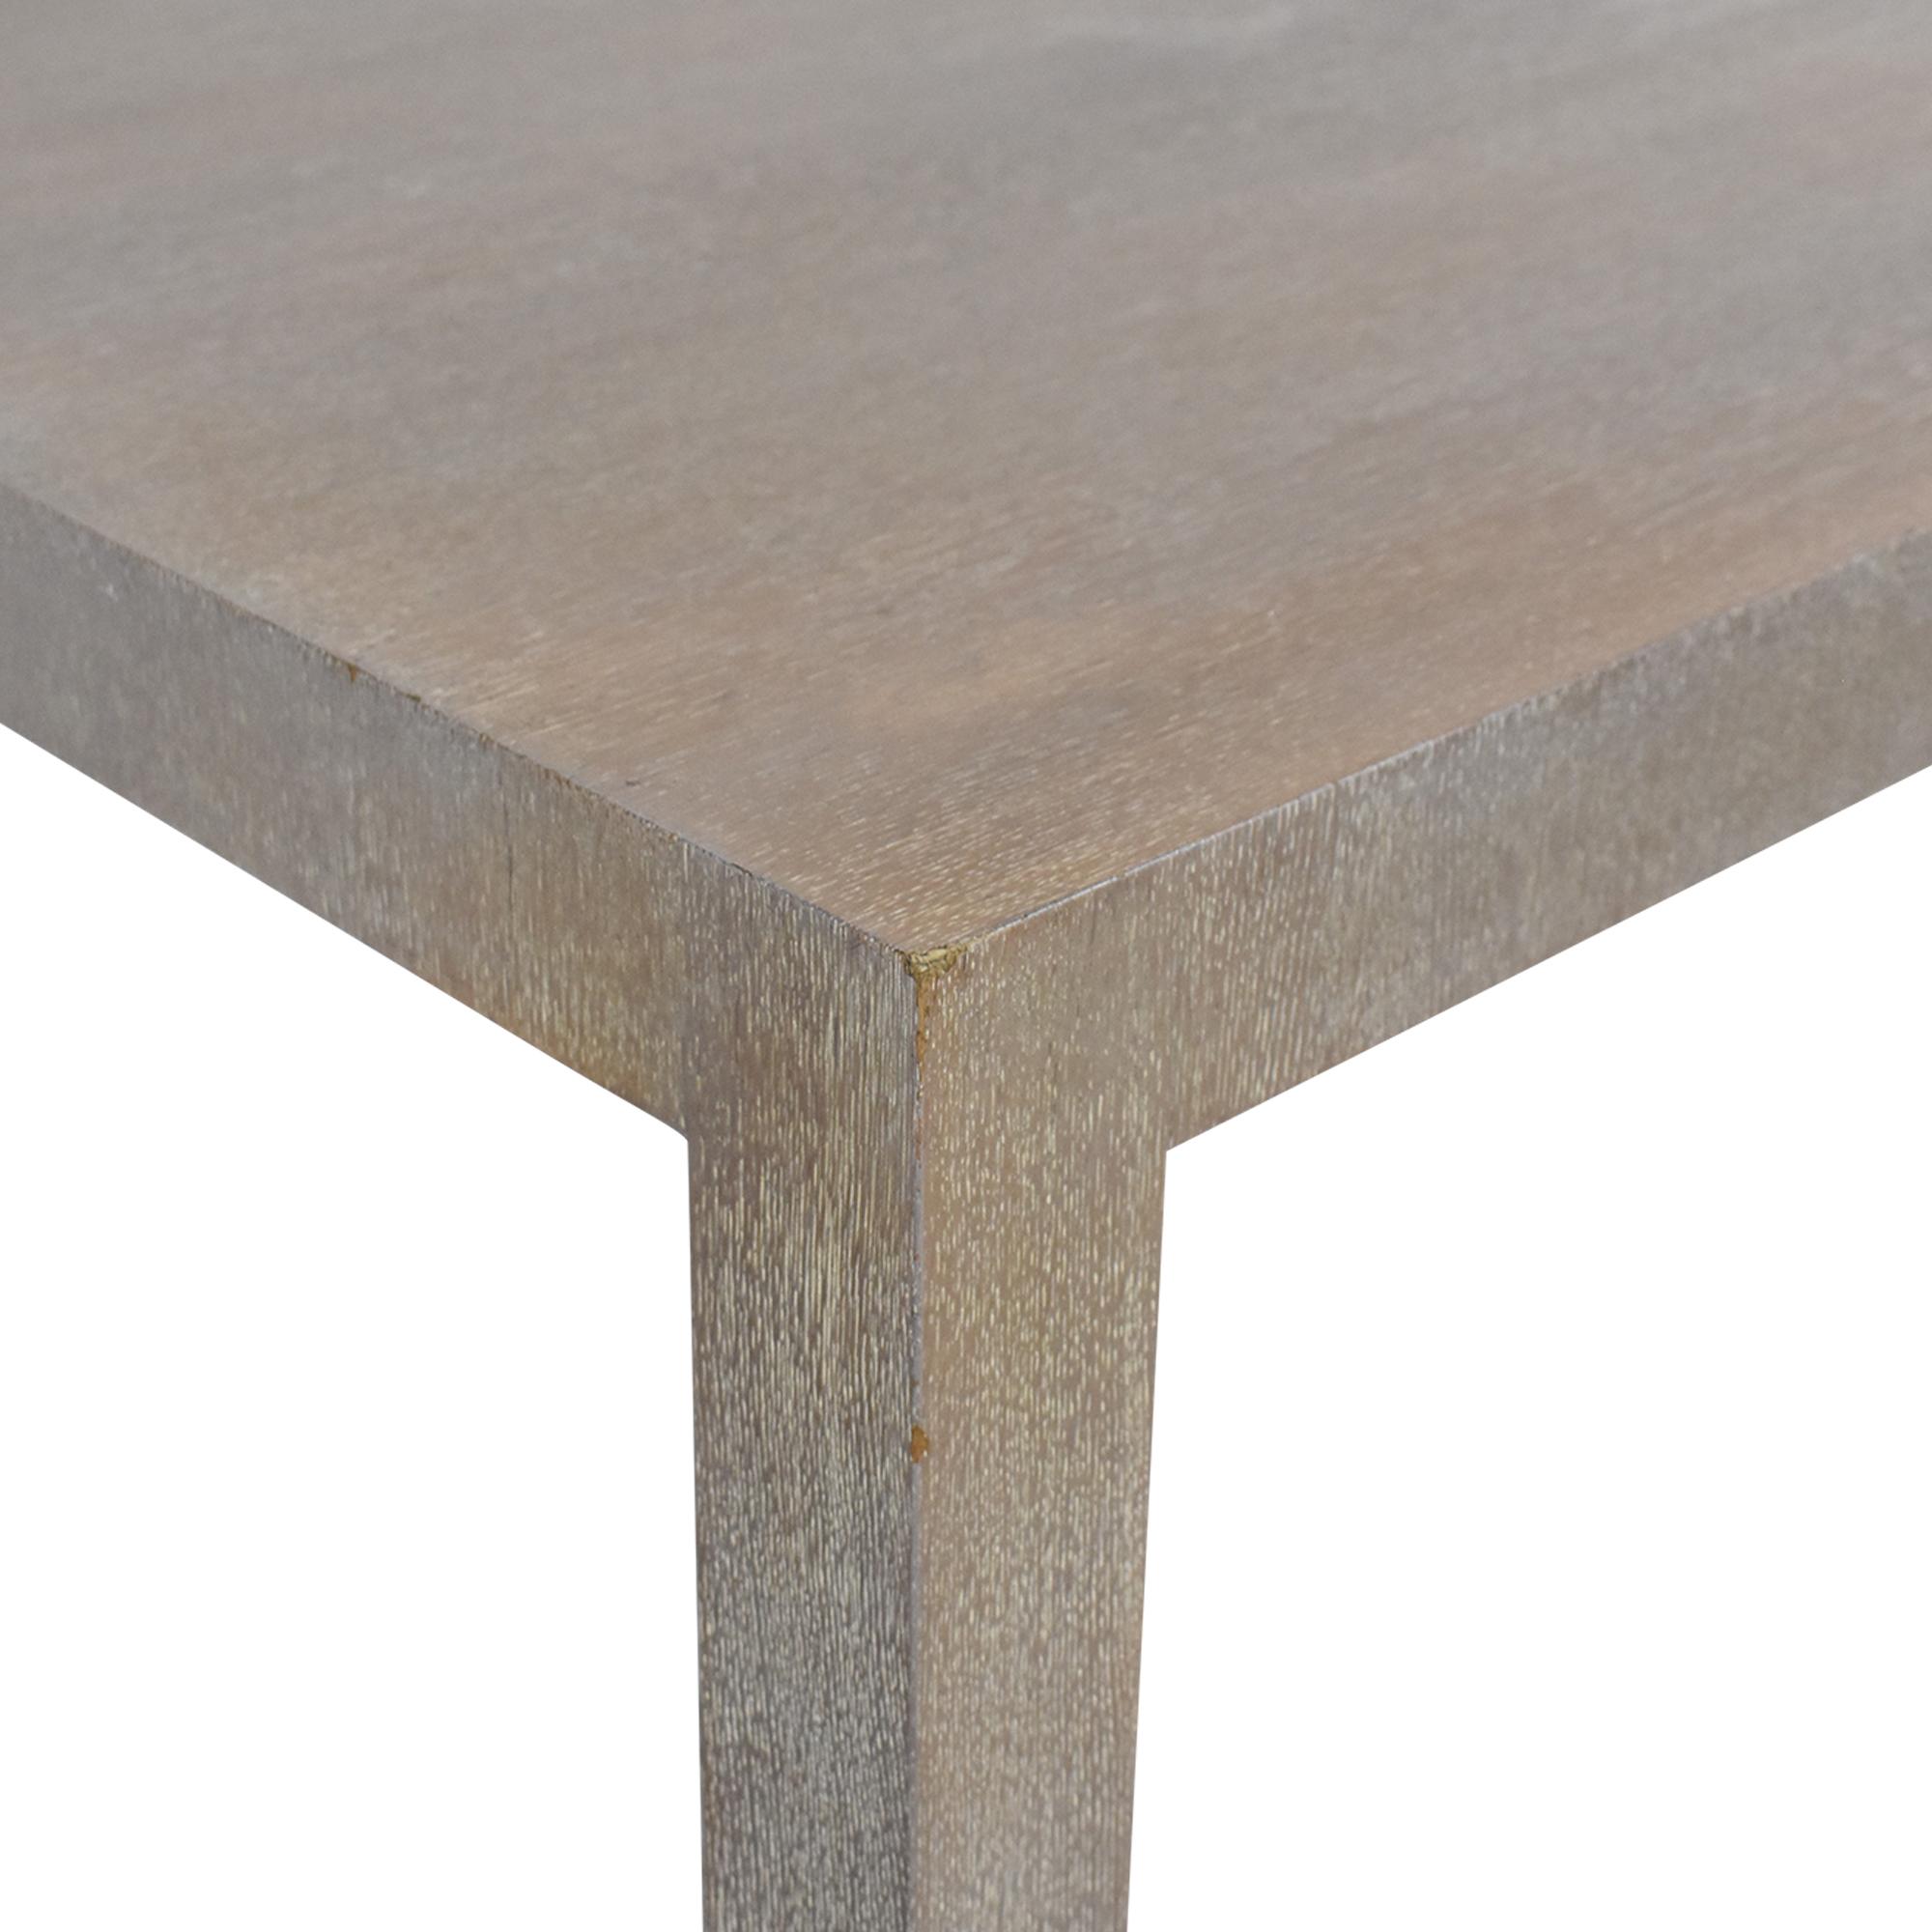 Armani Casa Dining Table / Dinner Tables